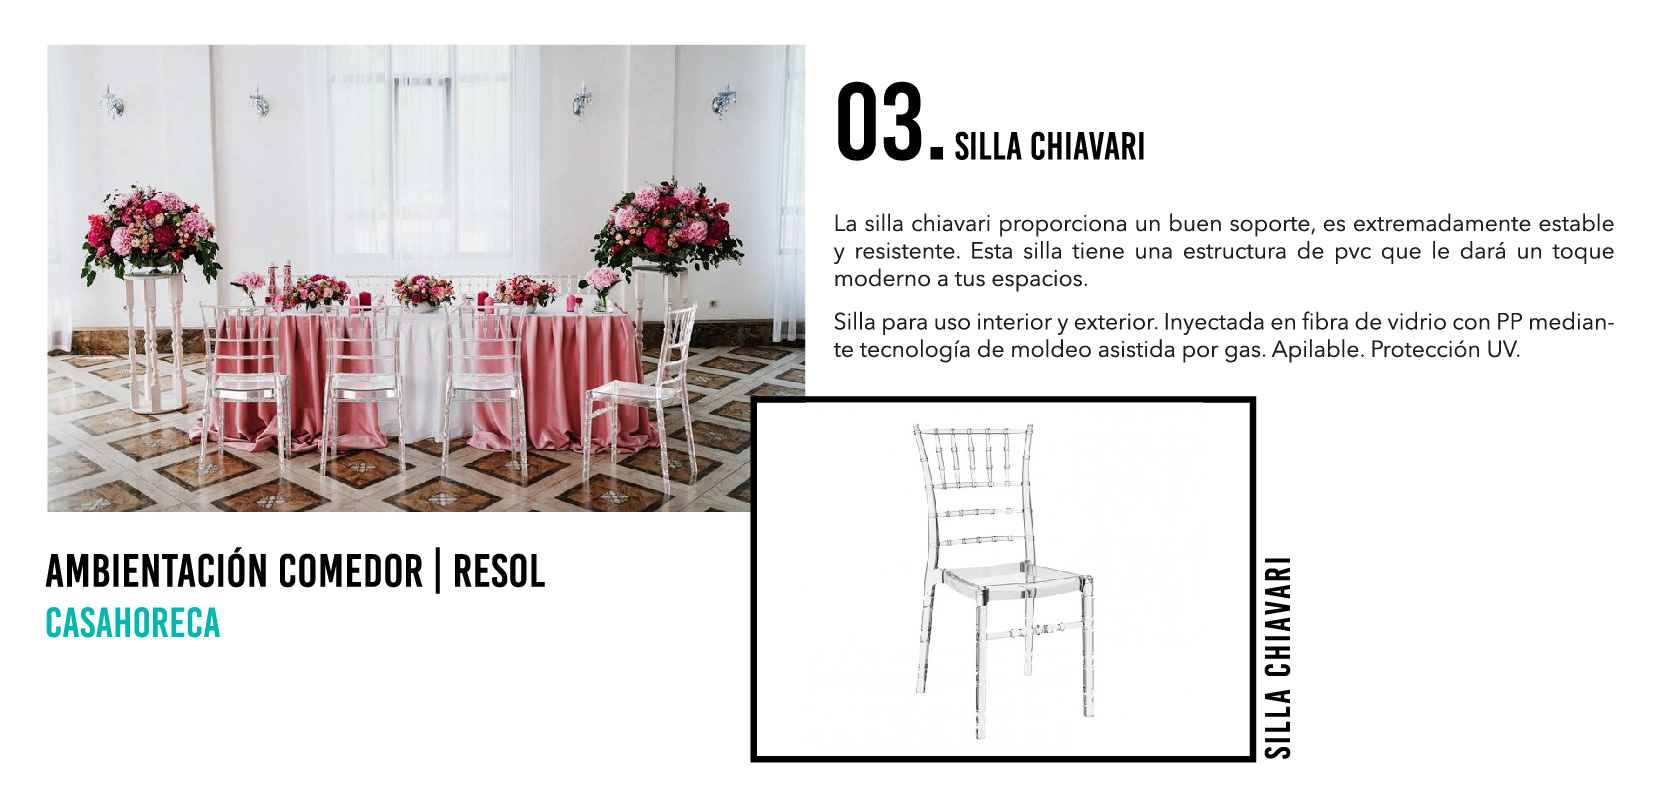 Silla Chiavari - Casahoreca.com